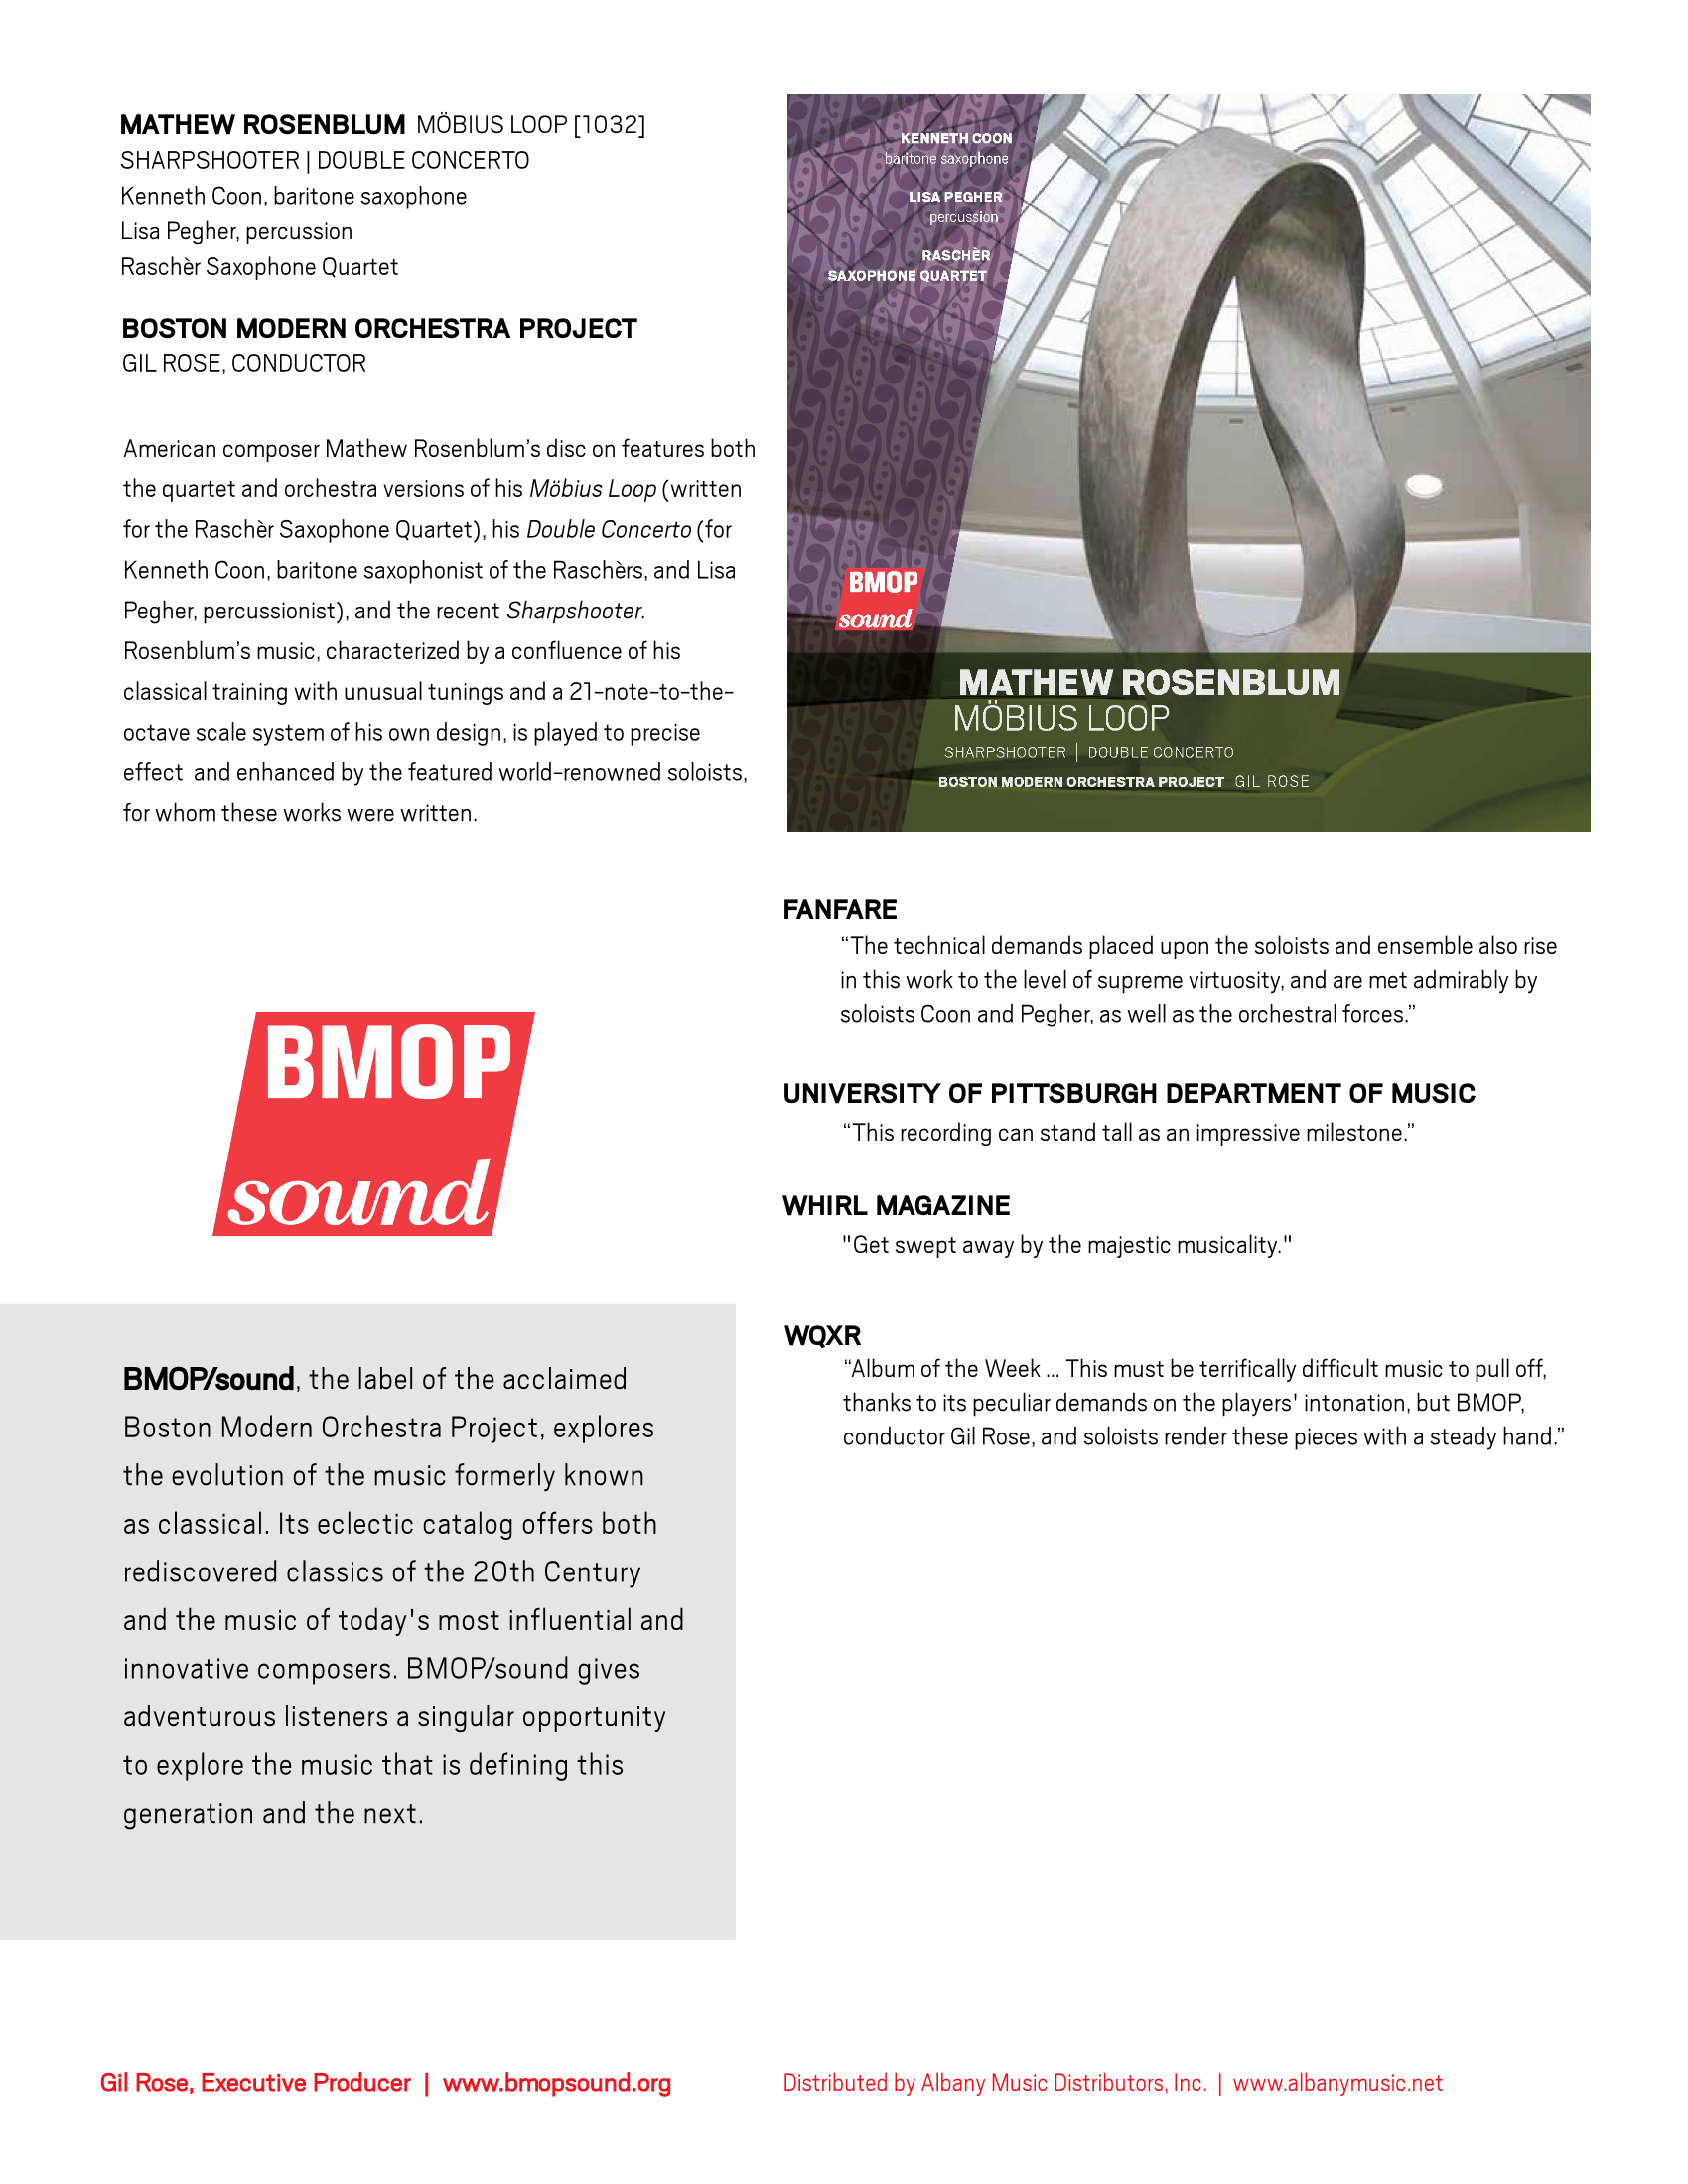 Rosenblum - BMOPsound 1032 one-sheet.png